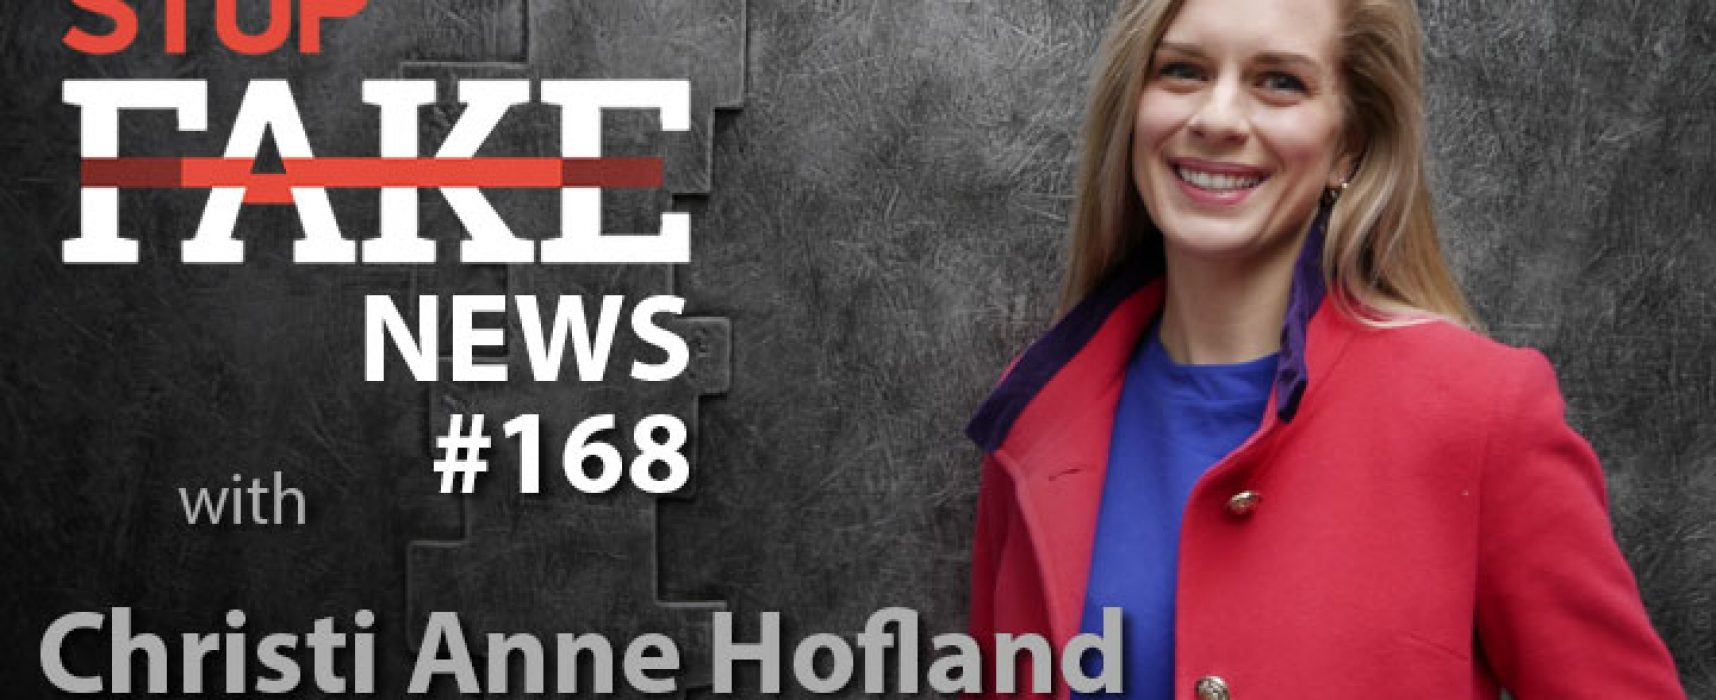 StopFake #169 [ENG] with Christi Anne Hofland